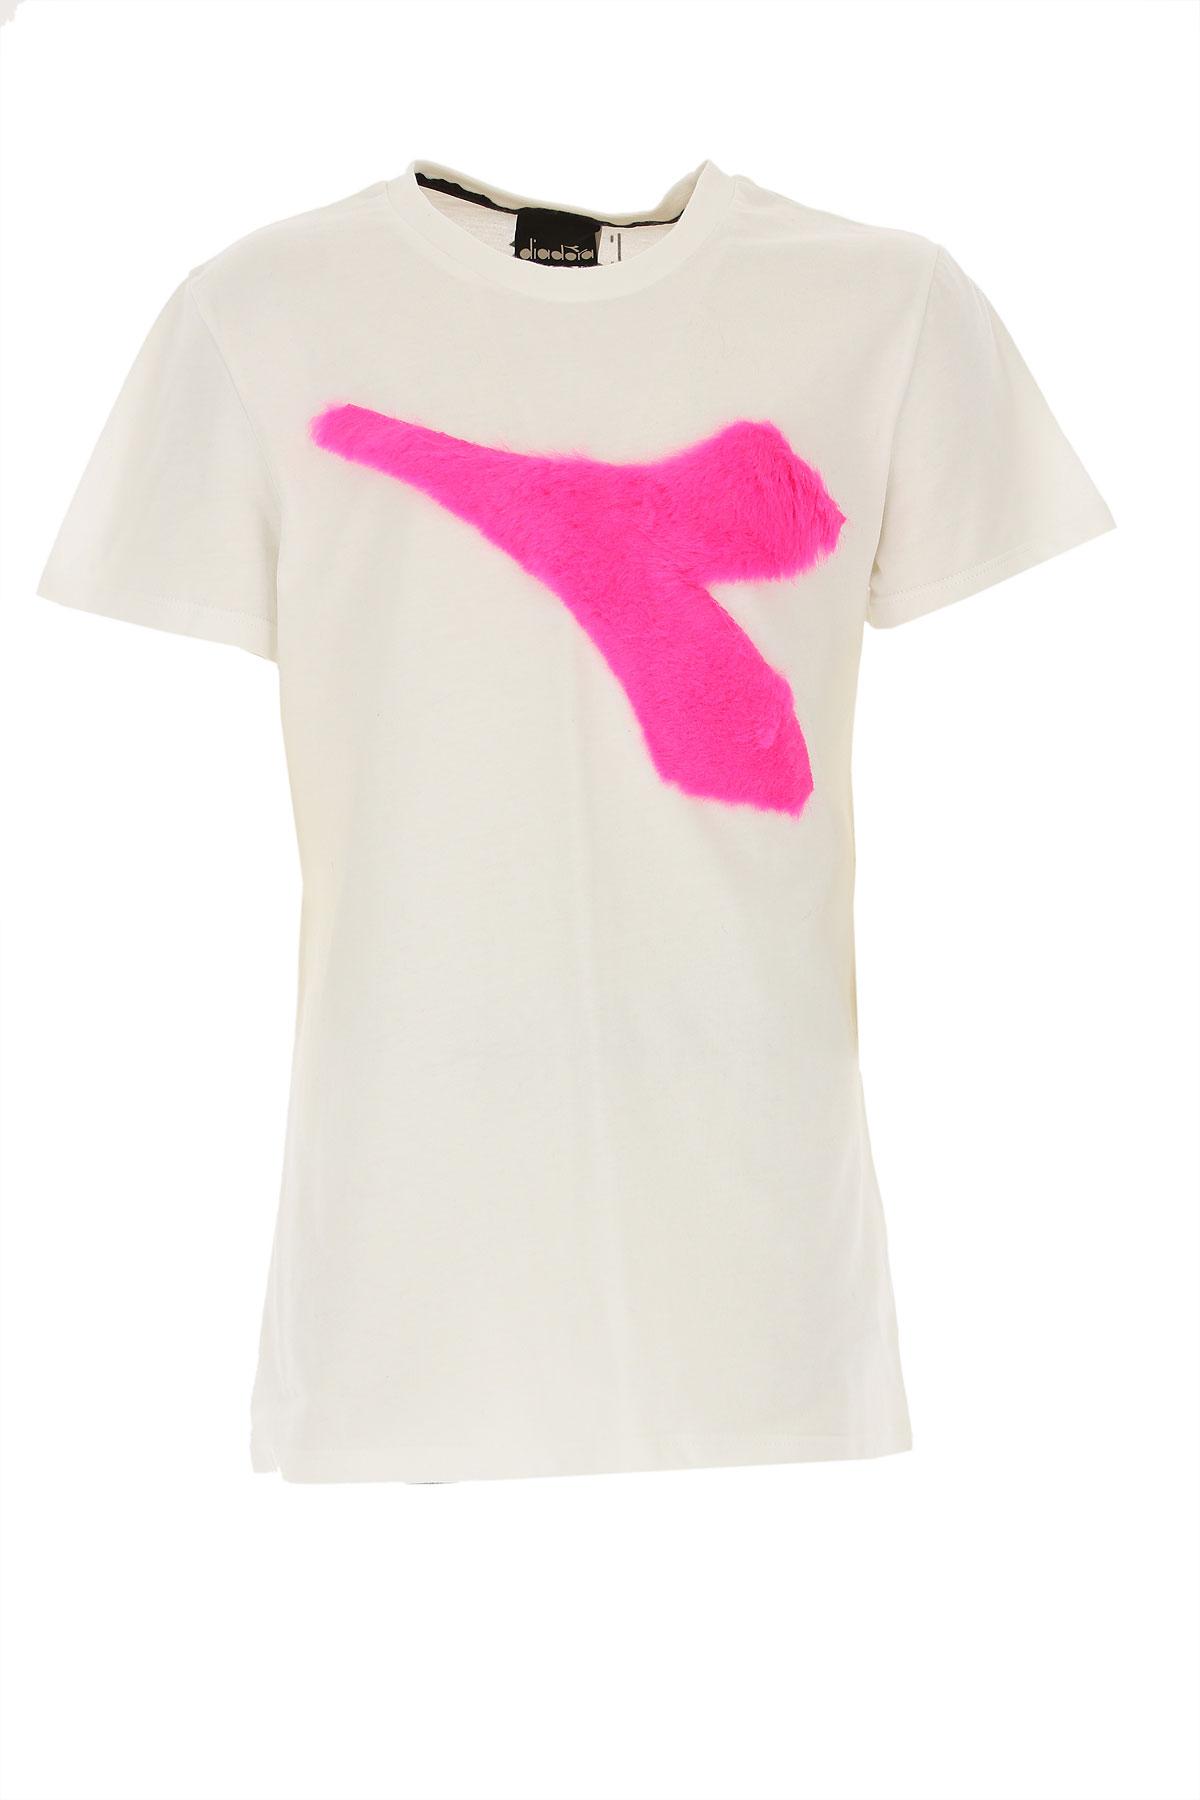 Diadora Kids T-Shirt for Girls On Sale, White, Cotton, 2019, 12Y 14Y 8Y